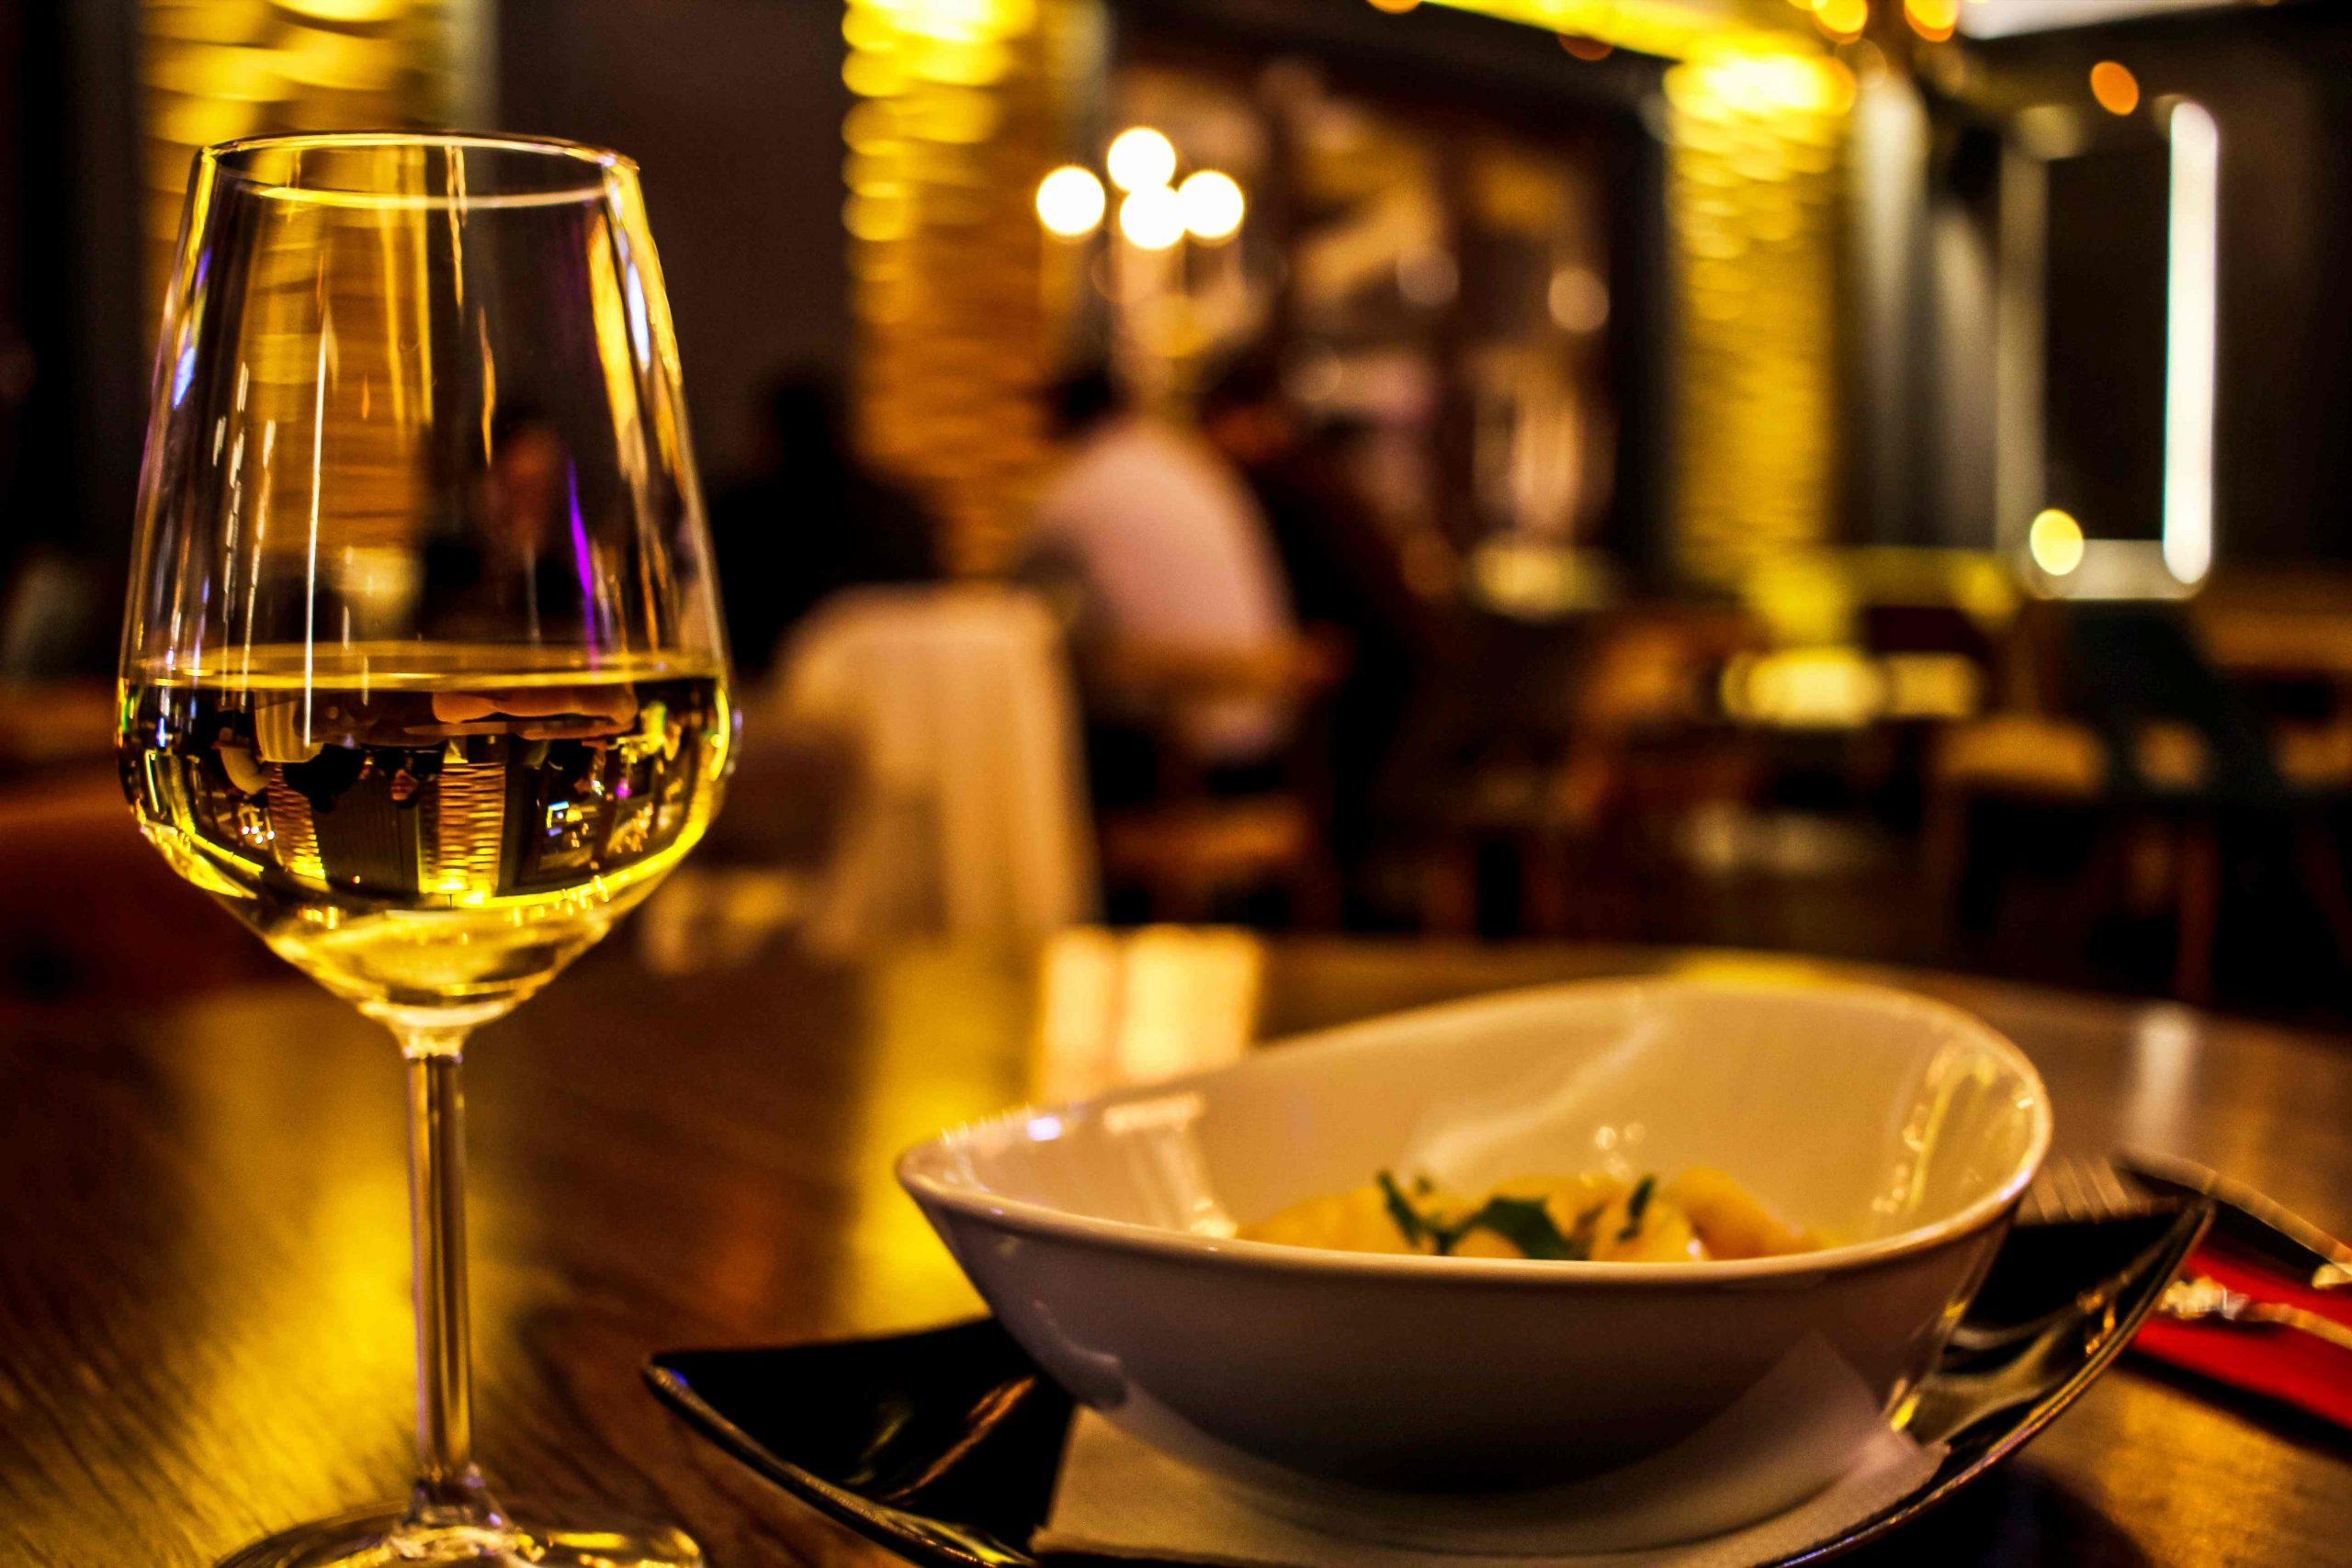 郵輪小費 - Wine Glass & Nuts